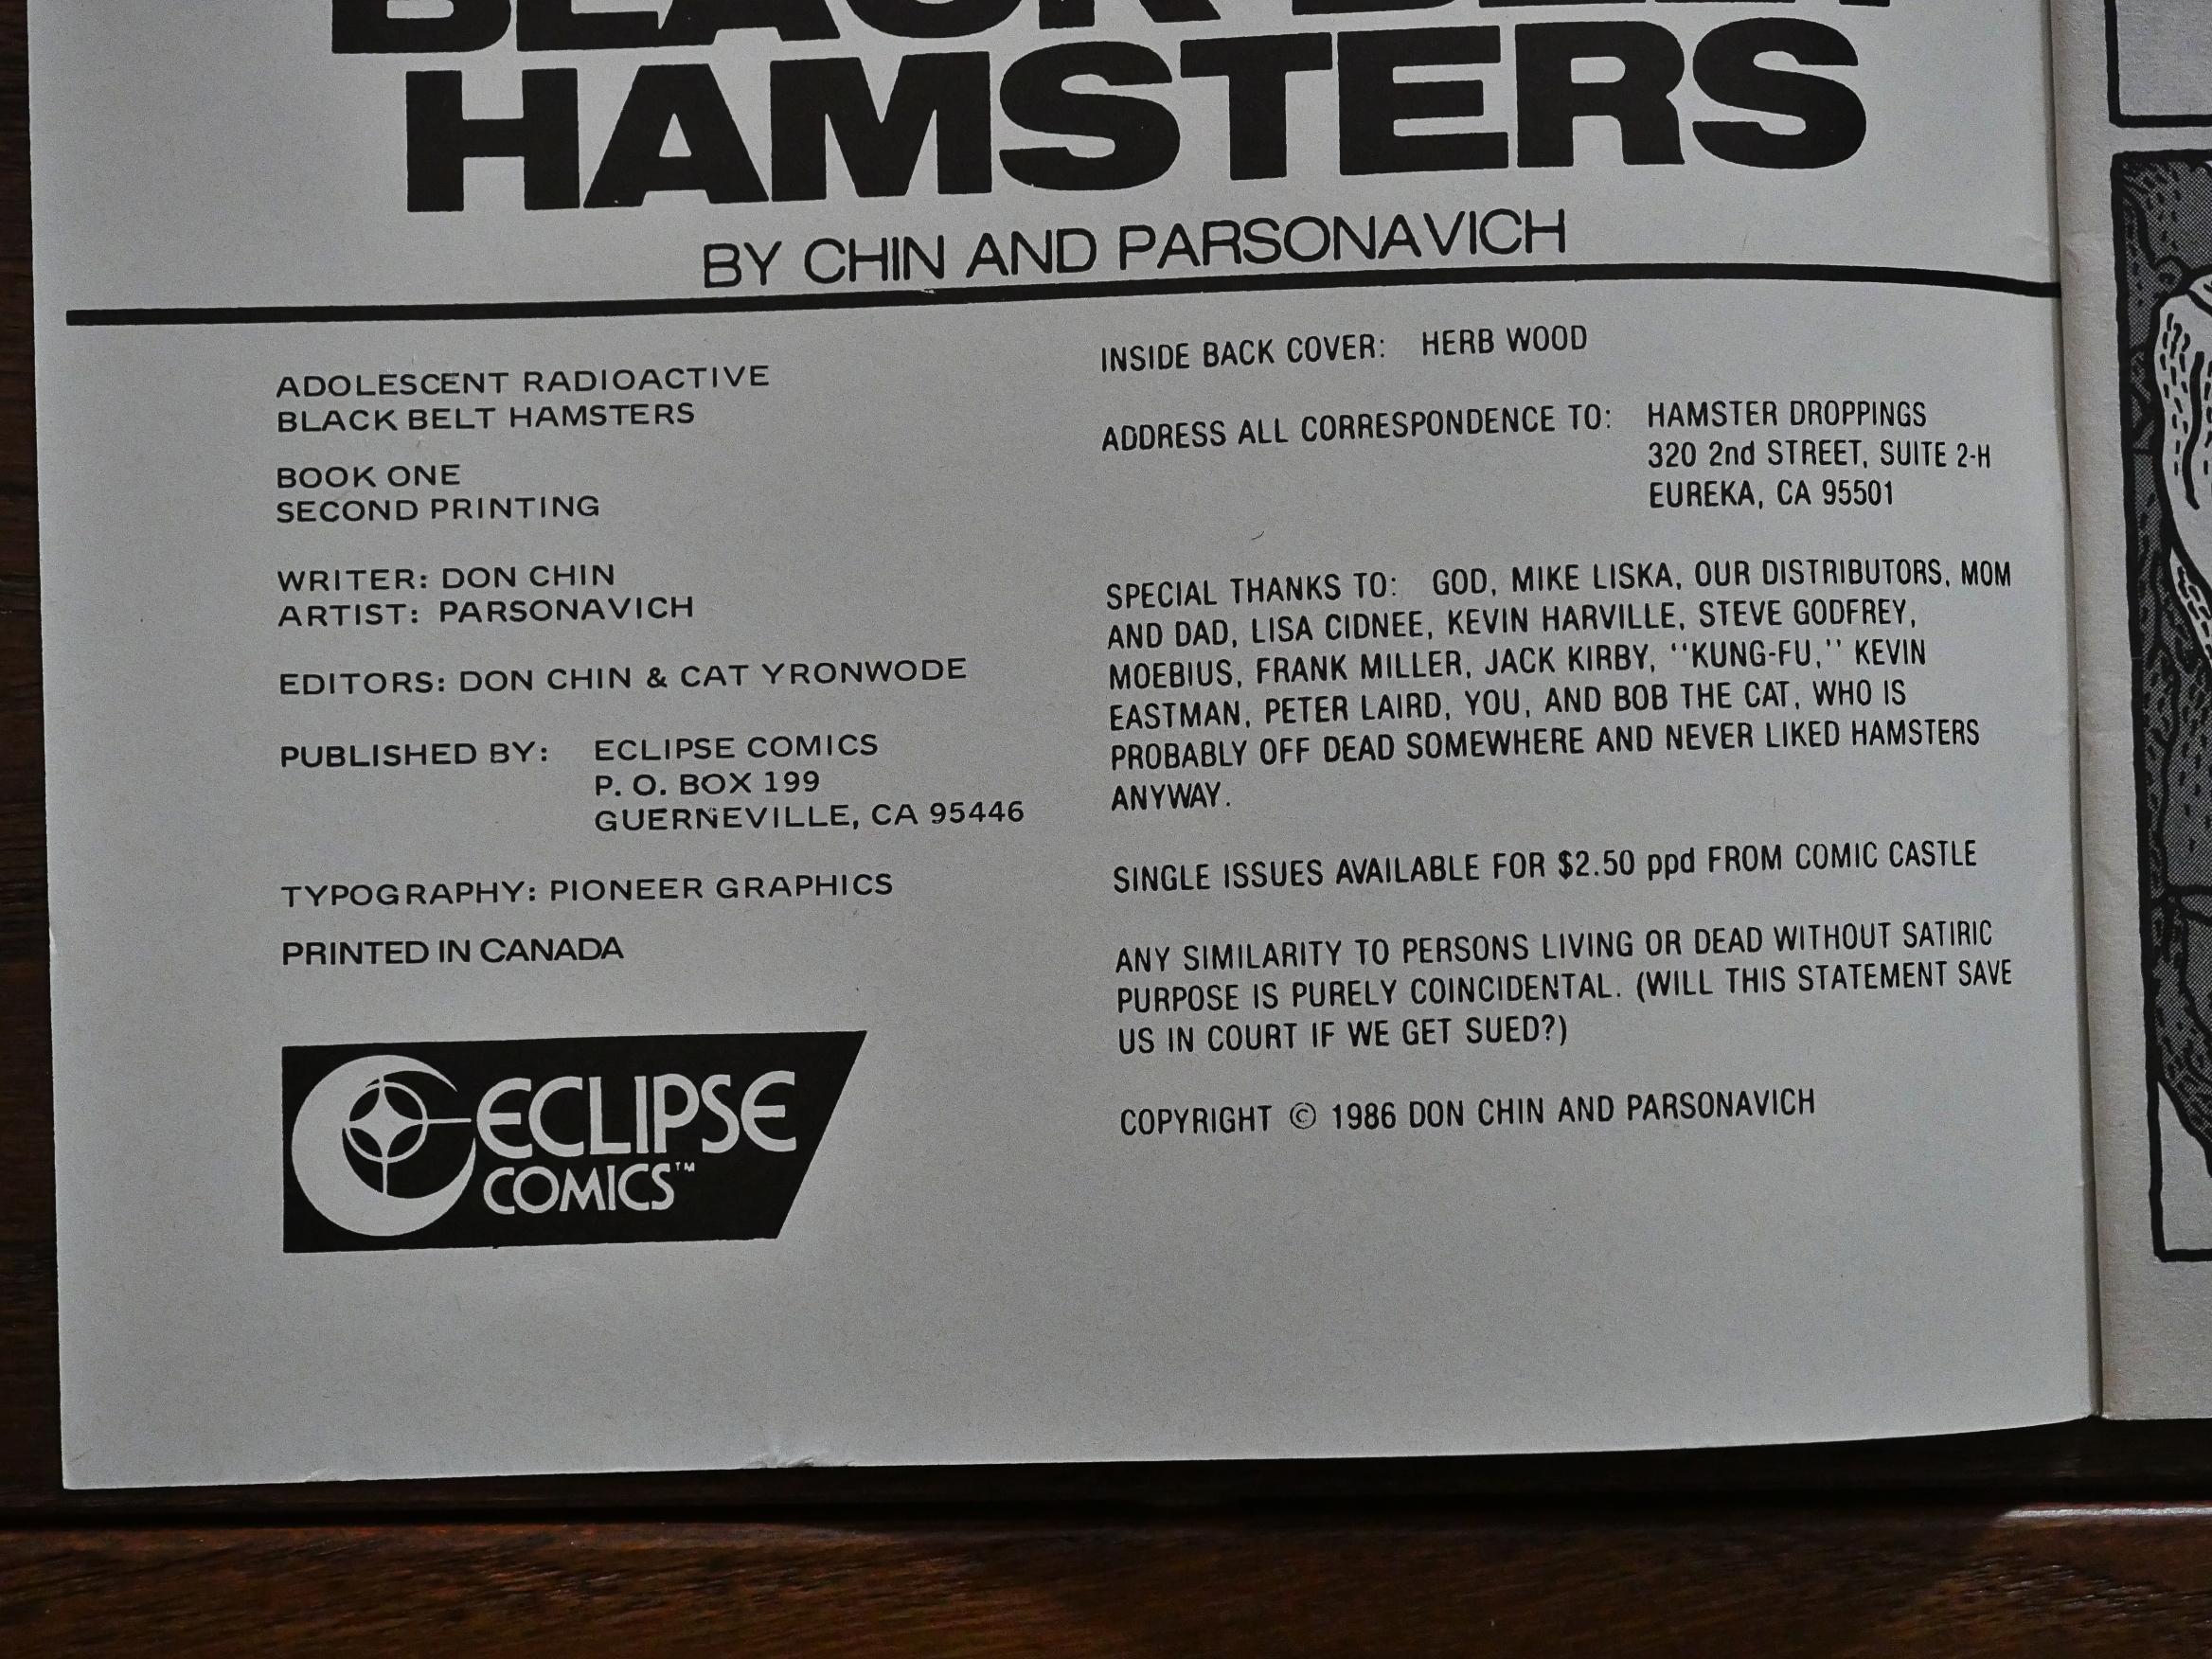 1986: Adolescent Radioactive Black Belt Hamsters &c – Total